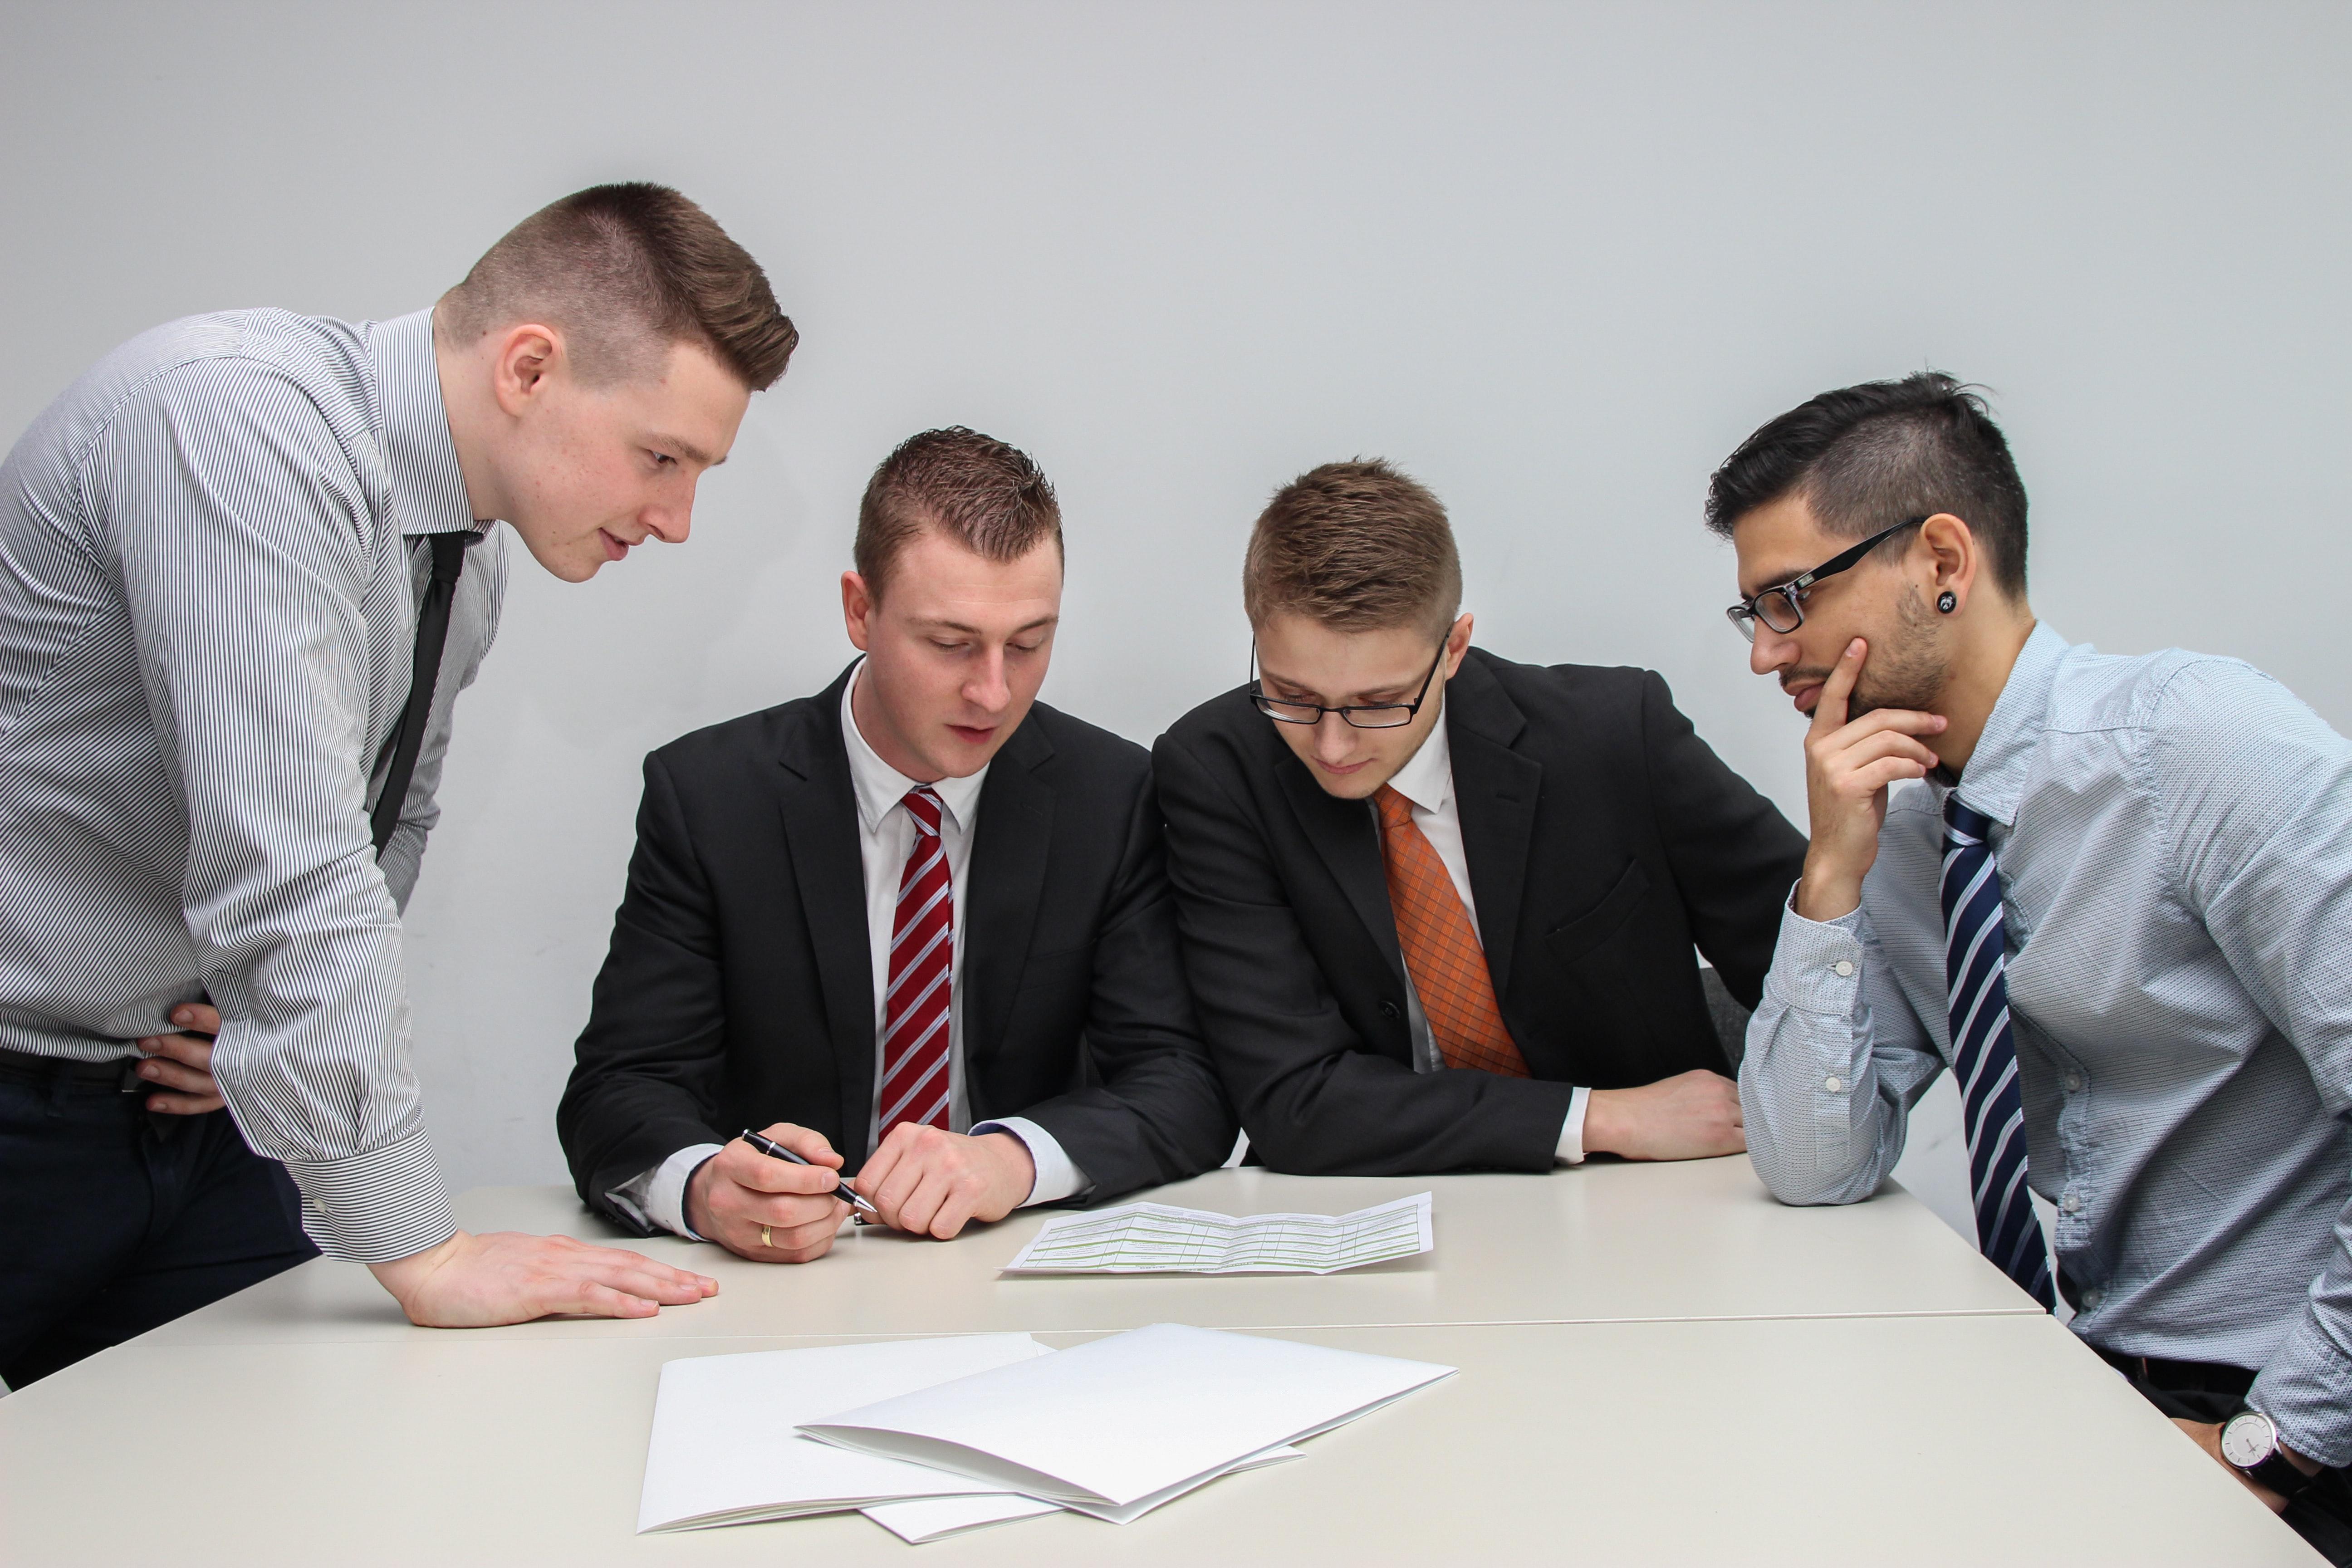 Membantu Mengoptimalkan Proses Pengambilan Keputusan